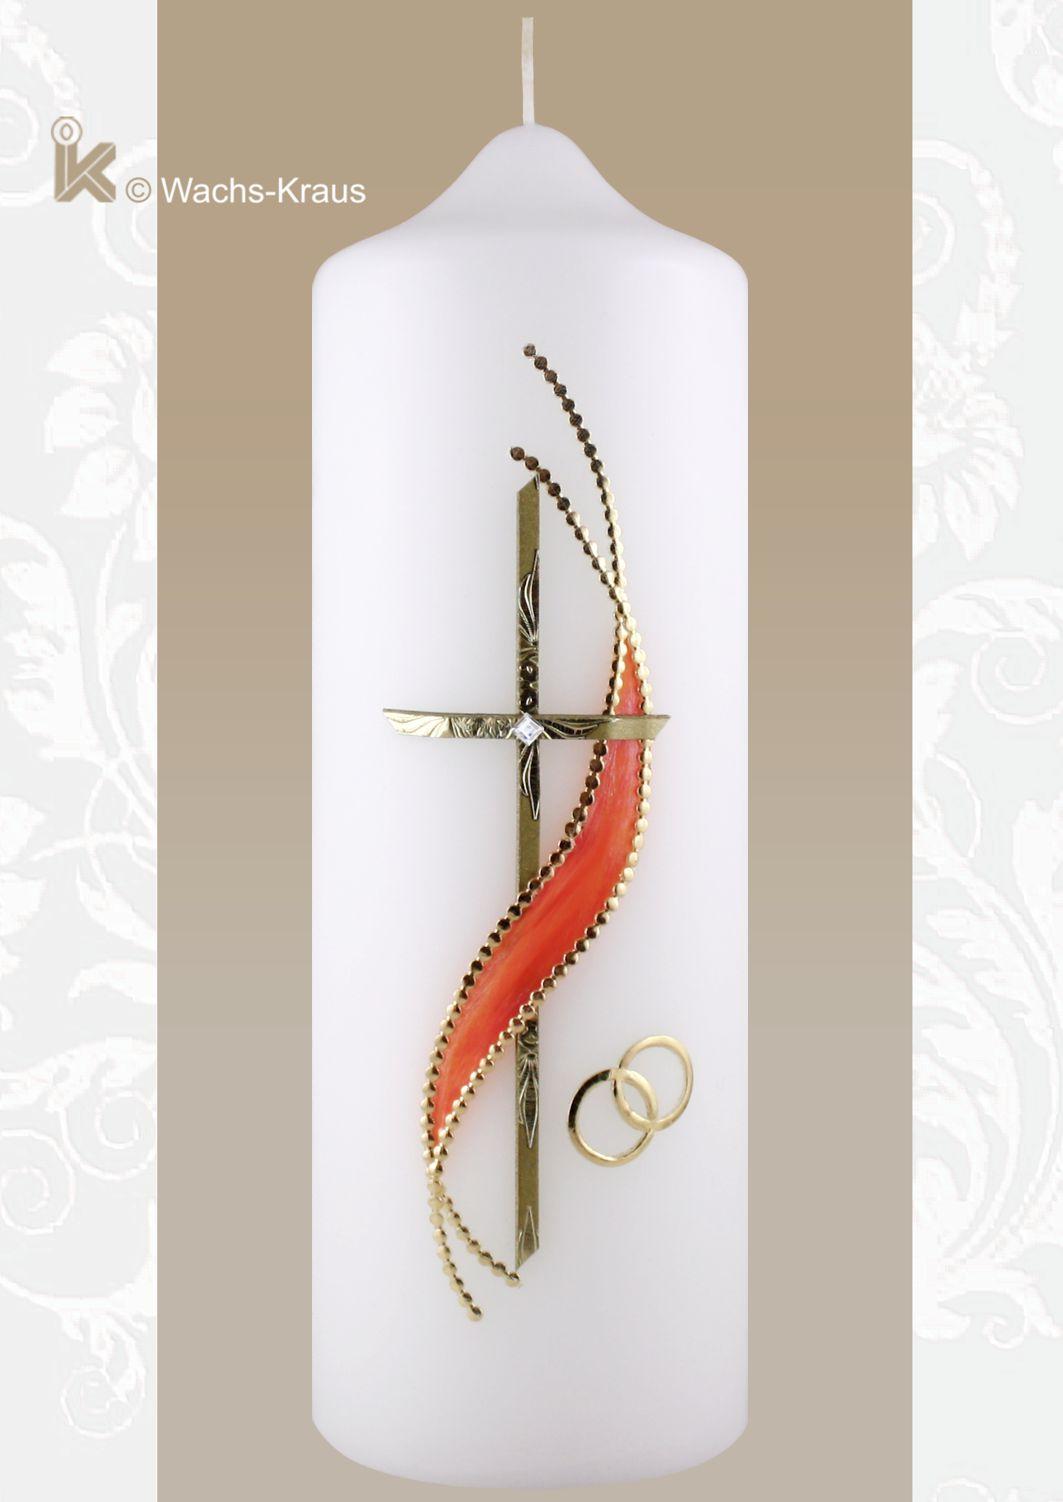 Hochzeitskerze goldenes Kreuz aprico verziert